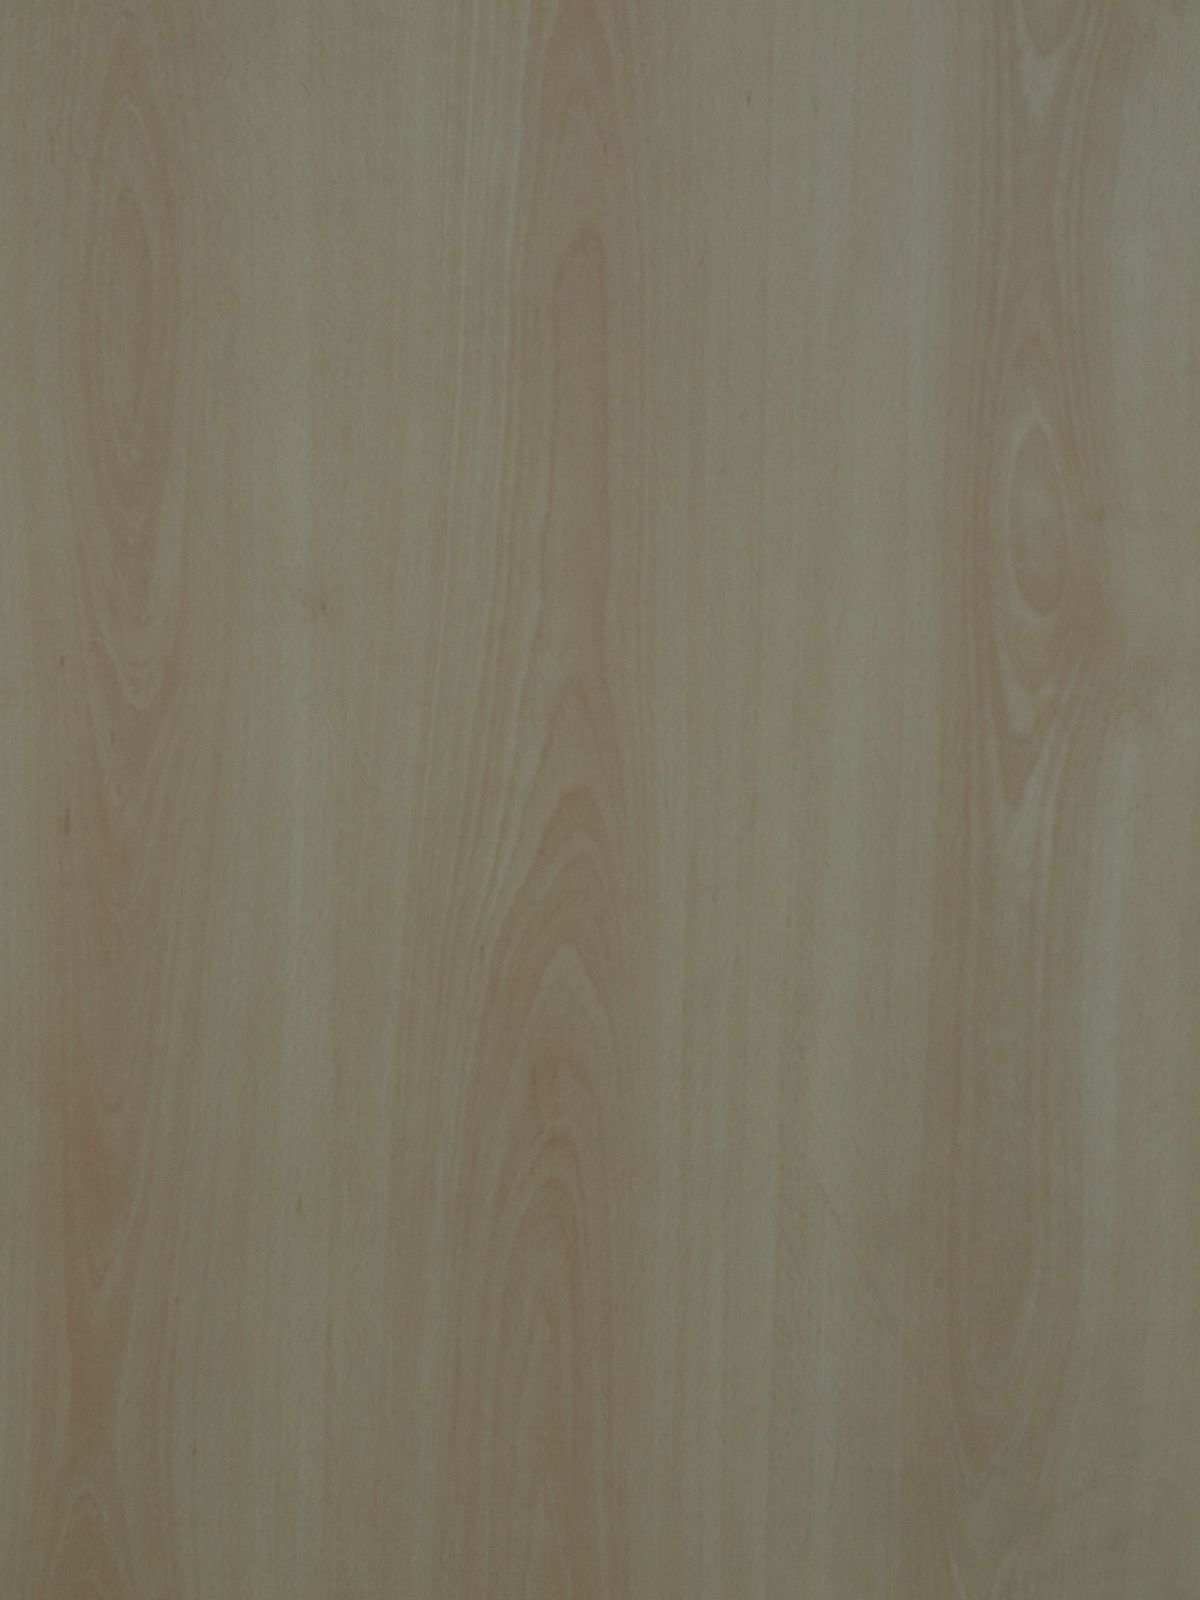 Wood_Texture_A_P1028709